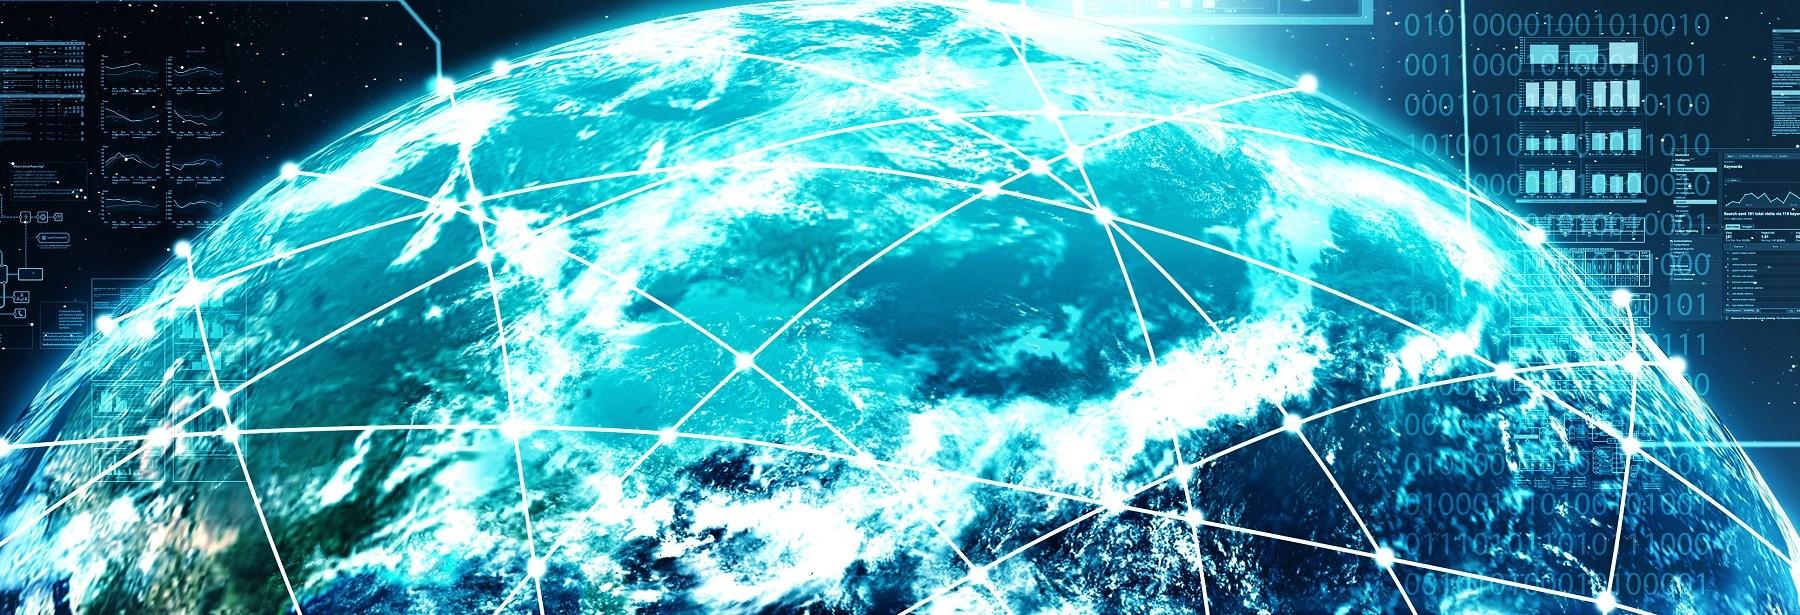 Telit announces IoT Cloud Connector for Libelium Waspmote ecosystem TechNative